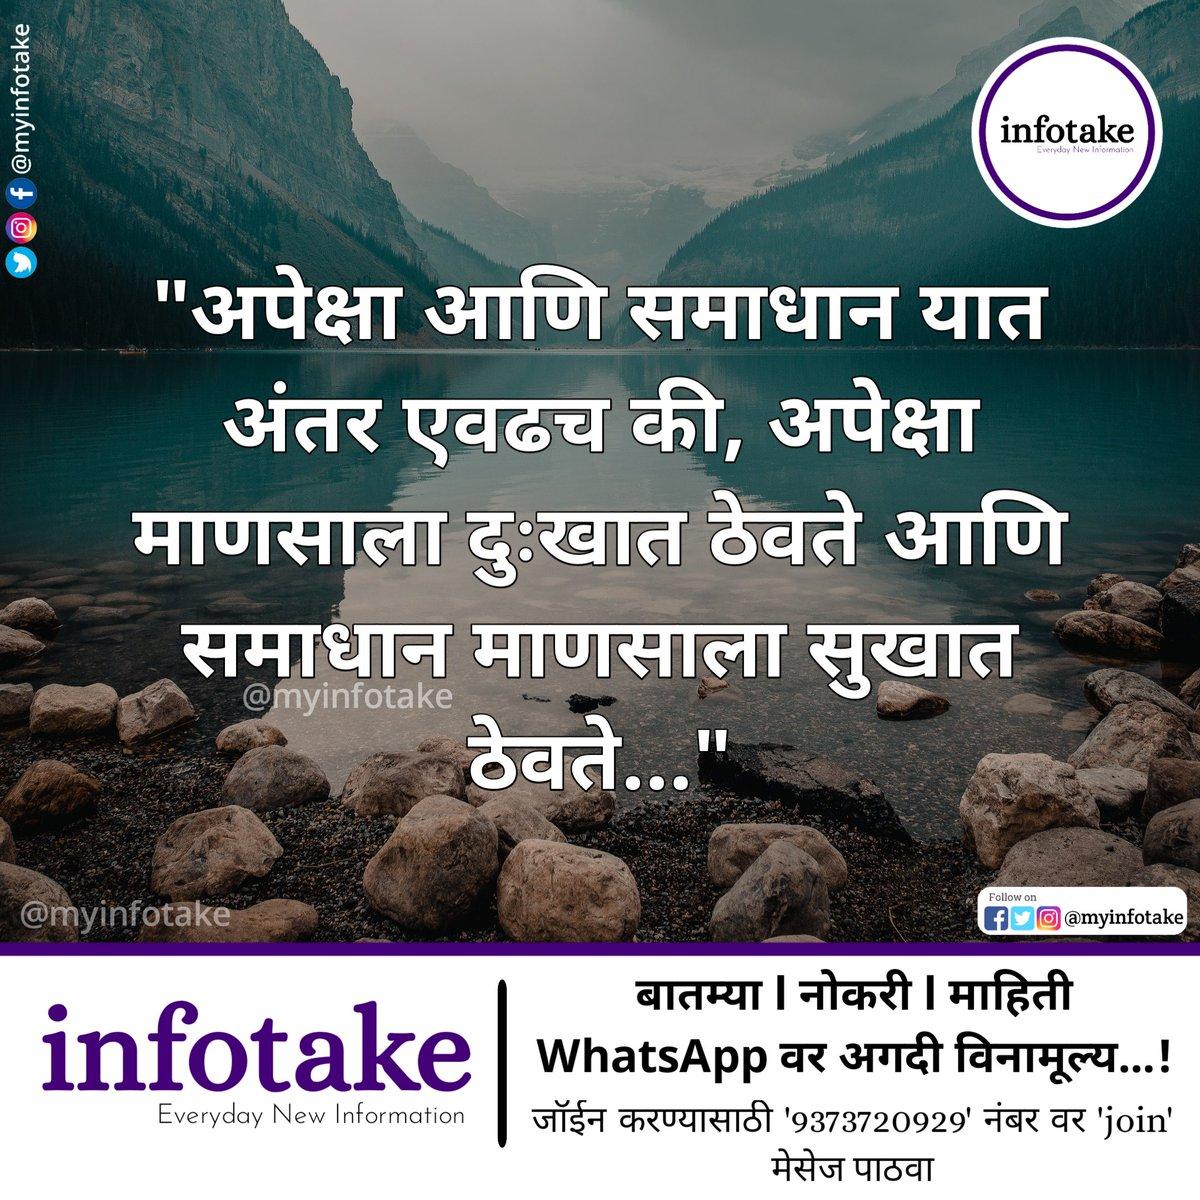 """अपेक्षा आणि समाधान यात अंतर एवढच की, अपेक्षा माणसाला दुःखात ठेवते आणि समाधान माणसाला सुखात ठेवते...""  @myinfotake #goodmorning #goodvibes #goodthings #goodthoughts #goodquote #quotes #suvichar #motivation #marathi #marathisuvichar #socialmedia #inspiration"